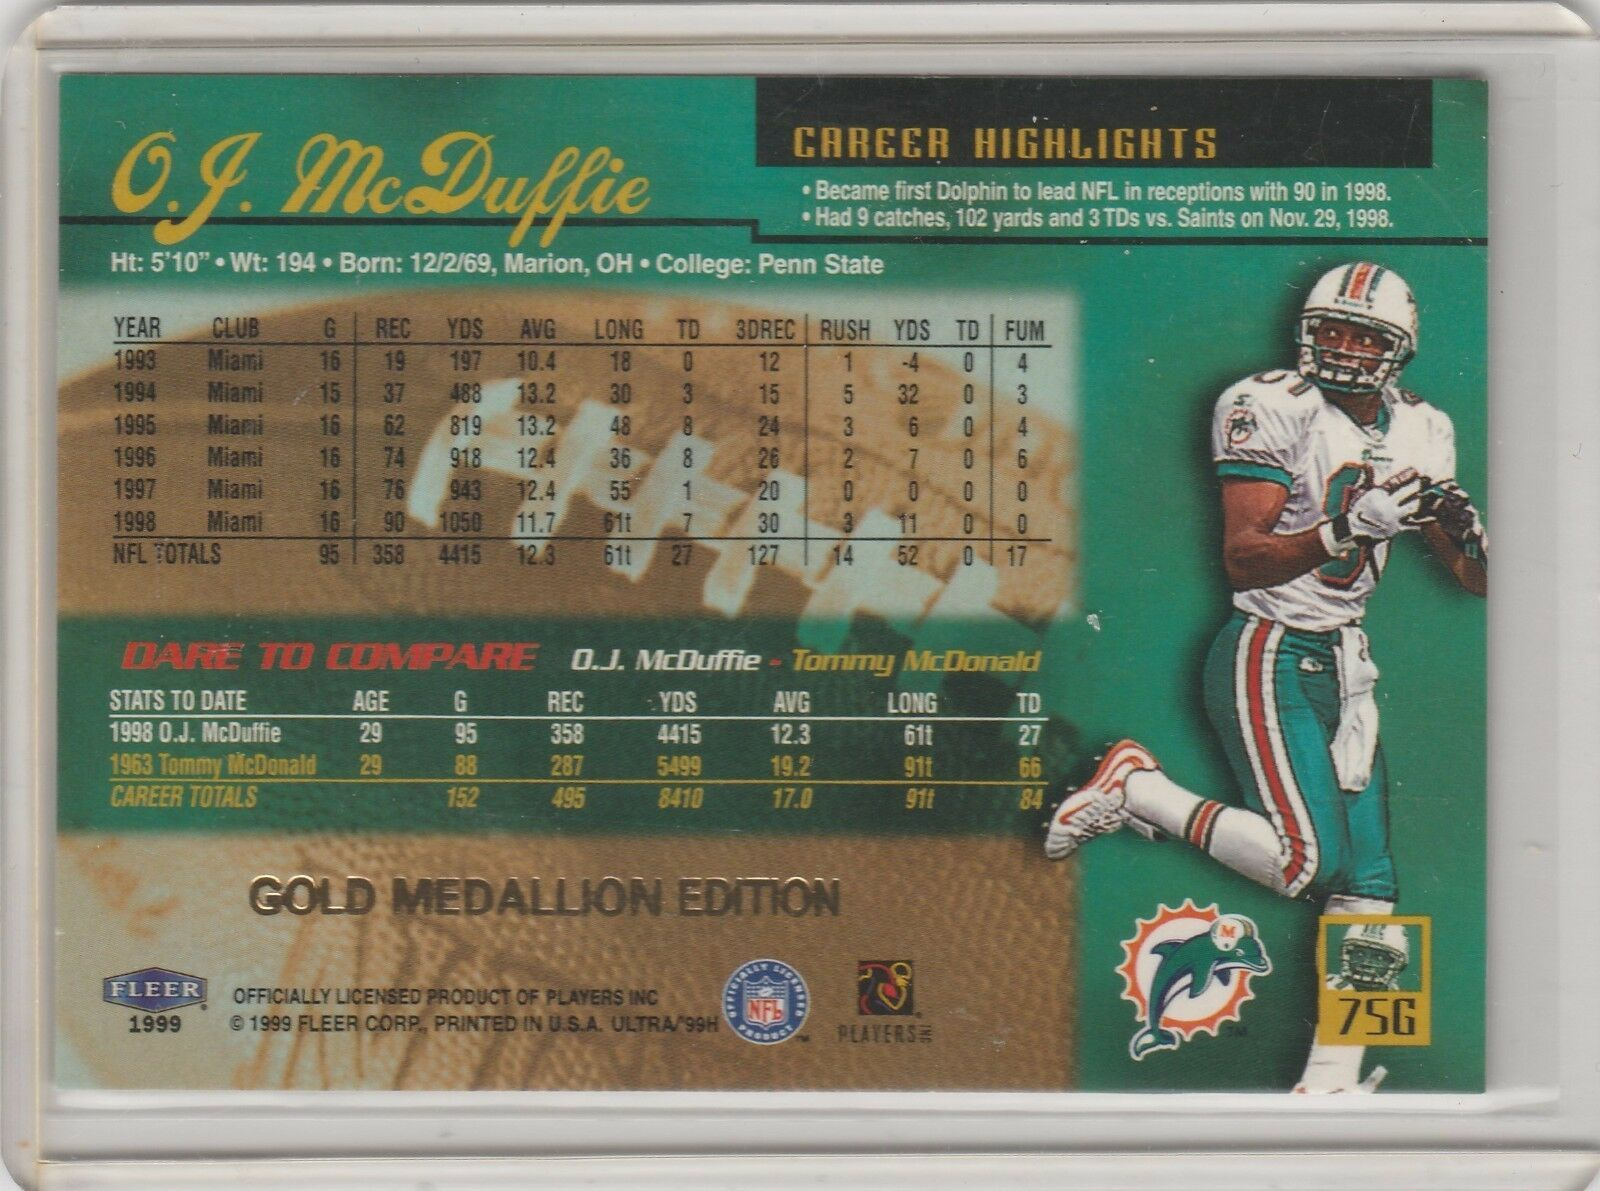 1999 Fleer Ultra Gold Medallion Edition #75G O.J. McDuffie